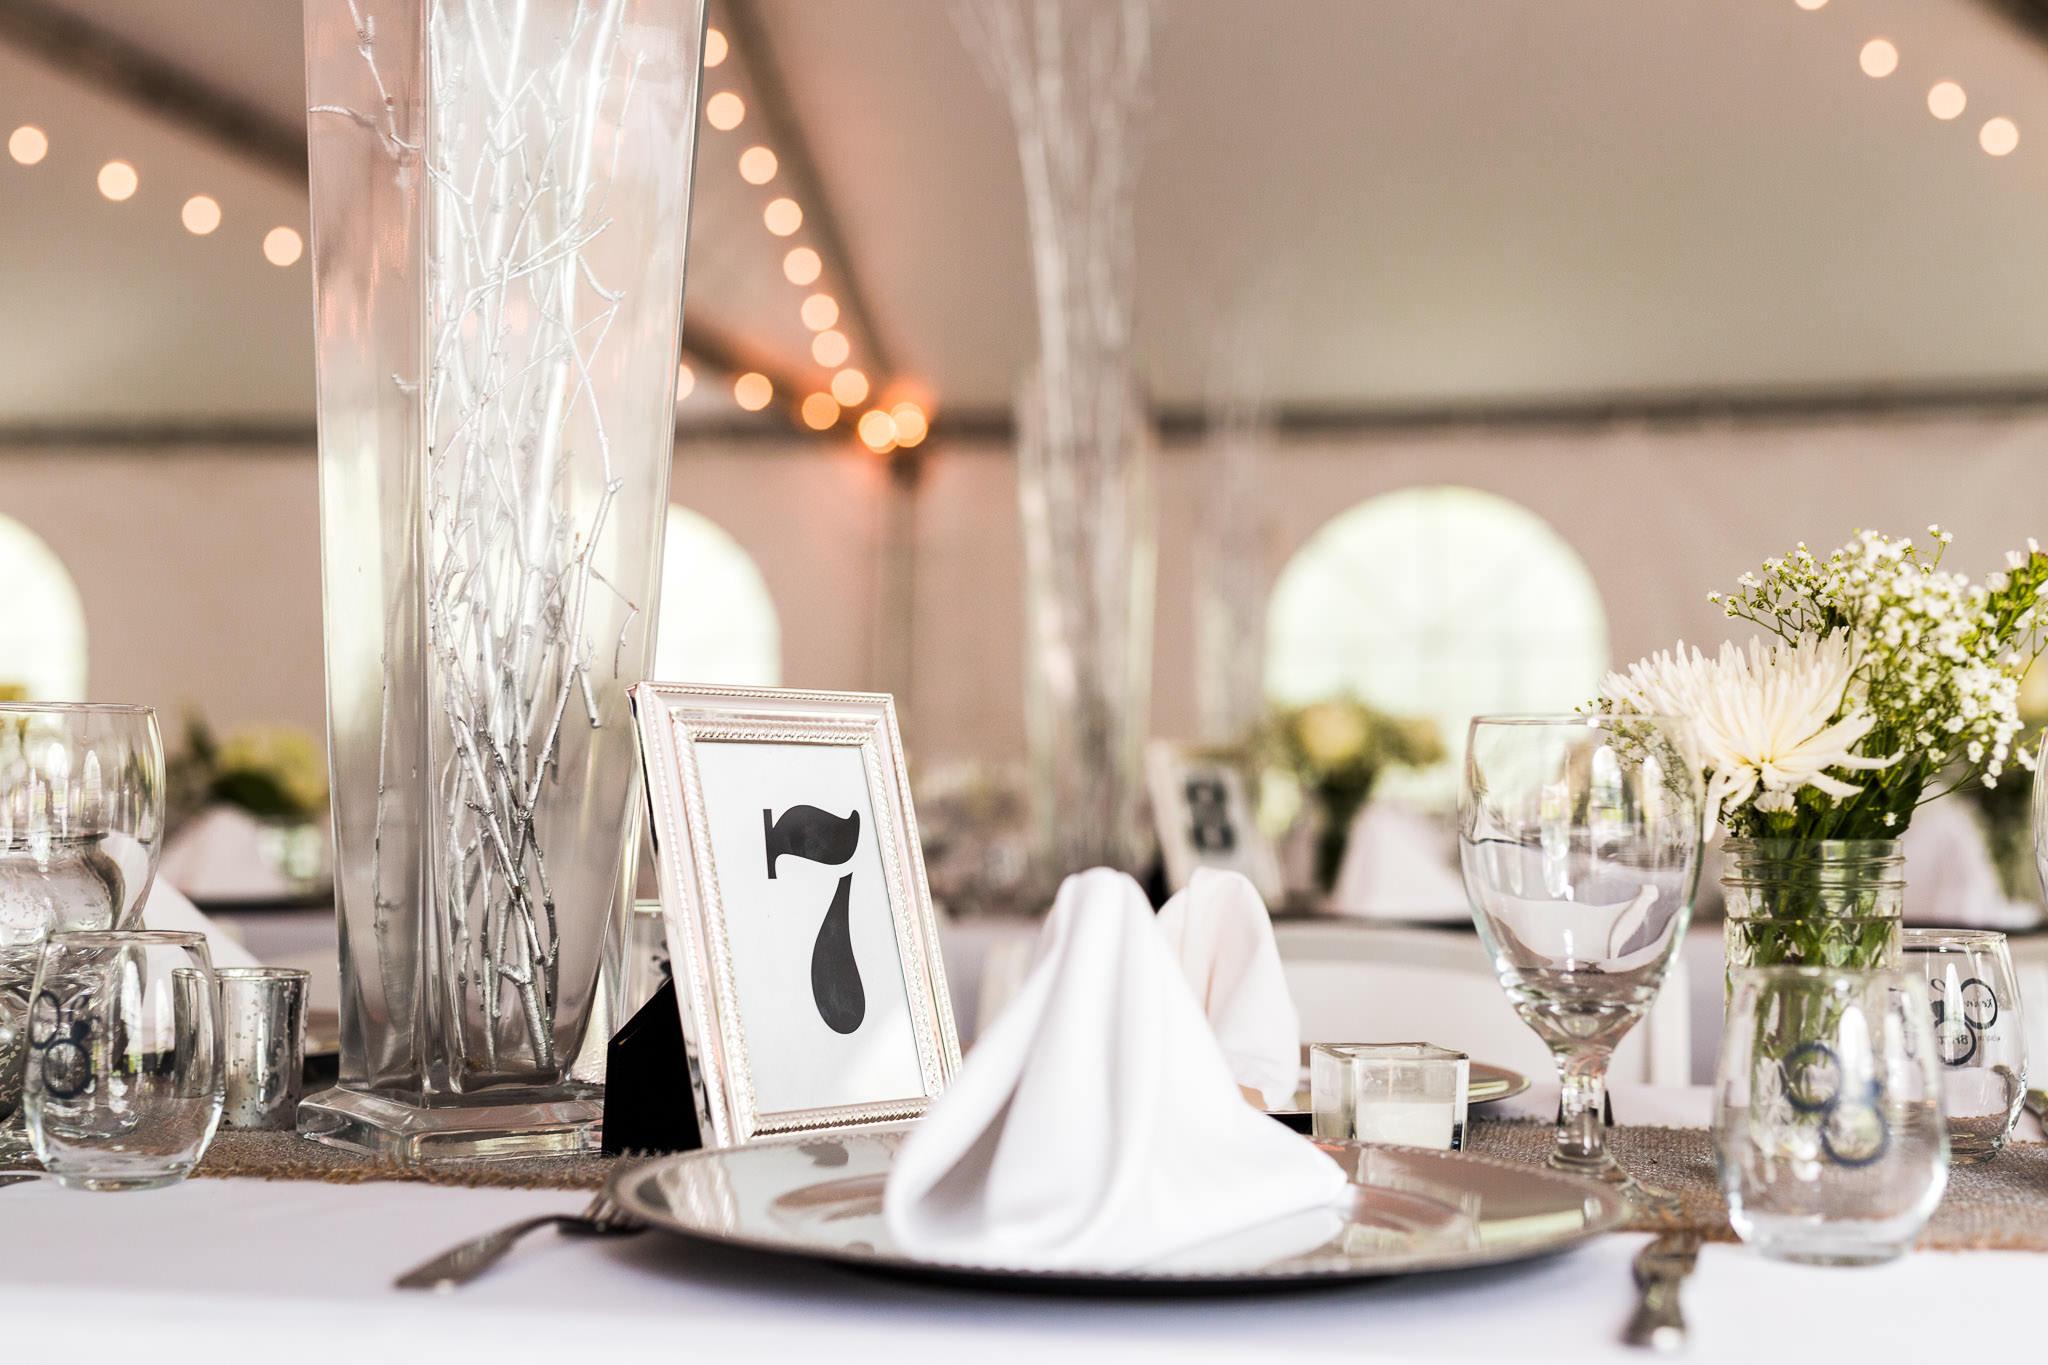 st-louis-photographer-backyard-wedding-1.jpg